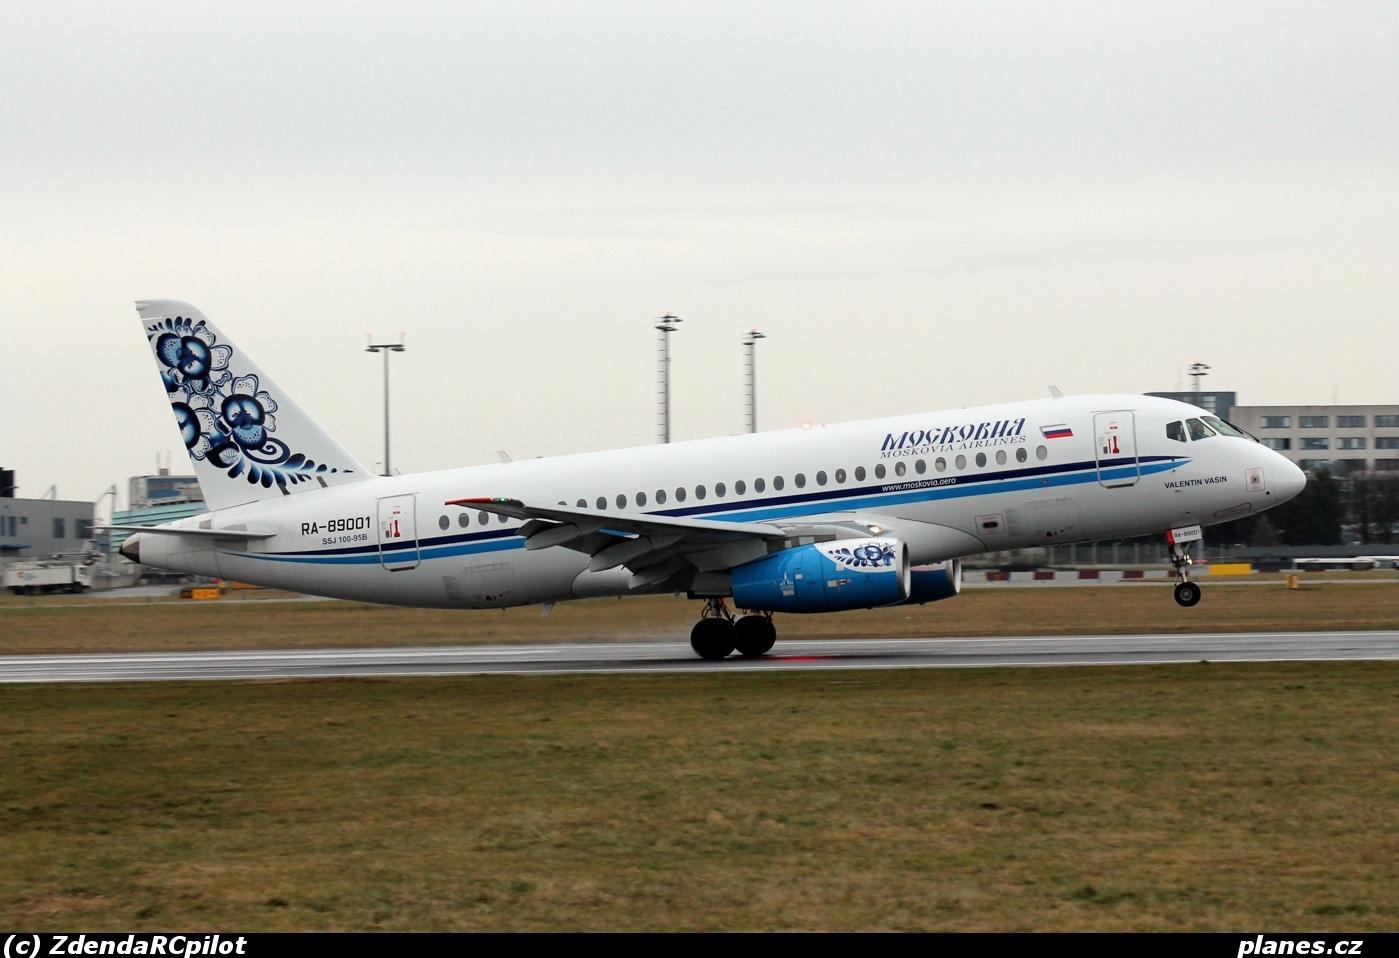 sukhoi-superjet-100-ra-89001-moscovia-airlines-gai-3r-prague-ruzyne-prg-lkpr%20%281%29.jpg